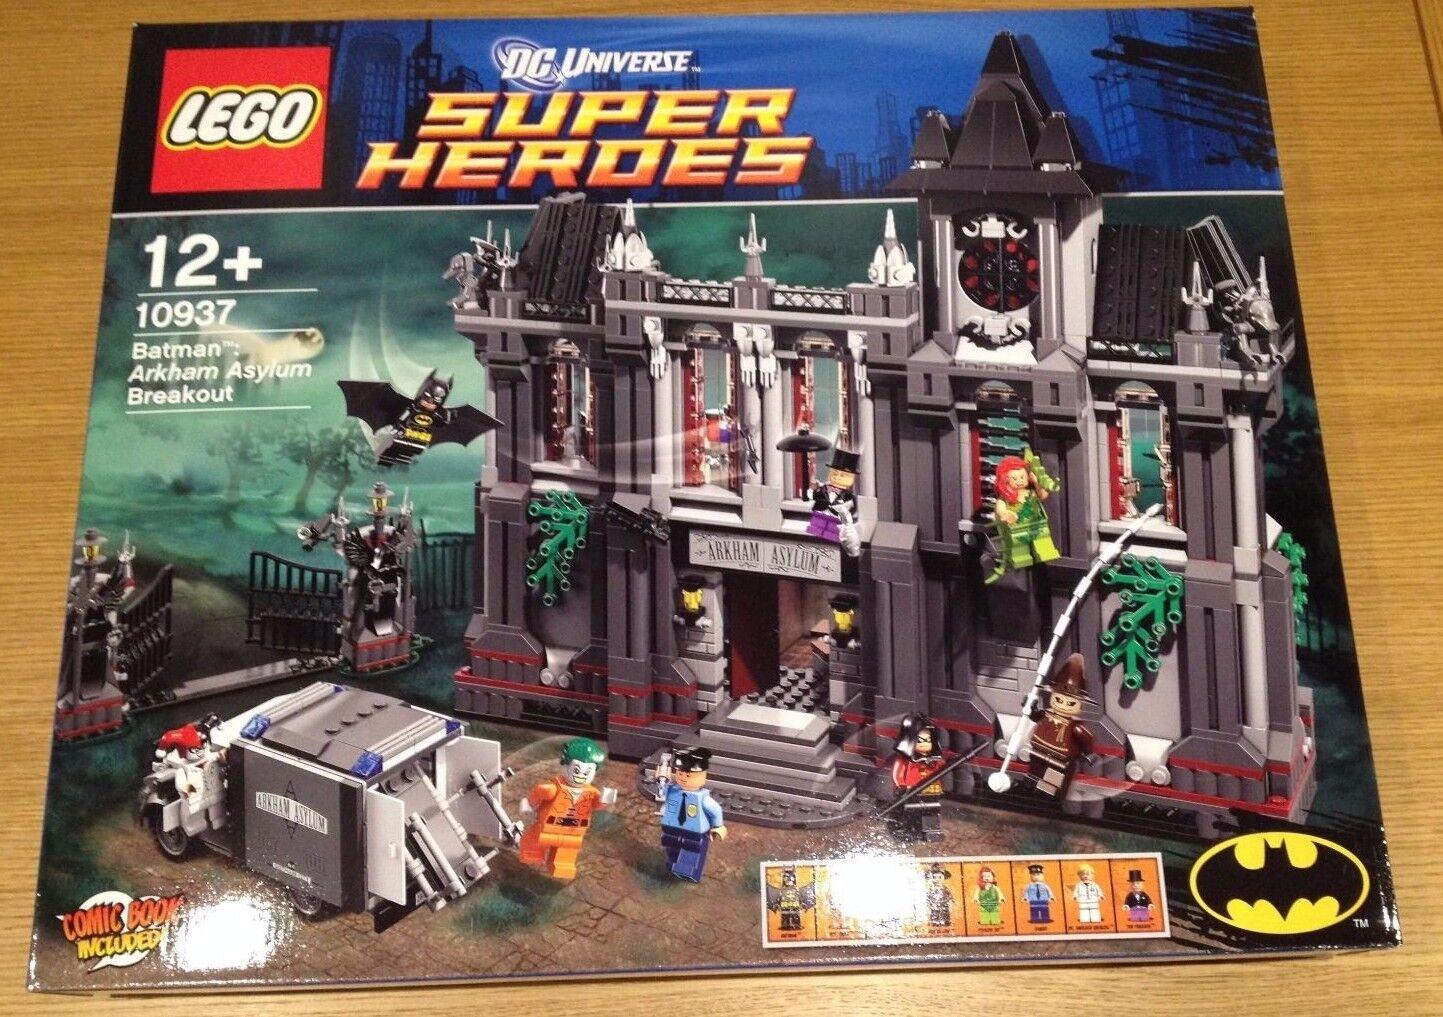 LEGO DC Comics Super Heroes Batman Arkham Asylum Breakout (10937) New Sealed